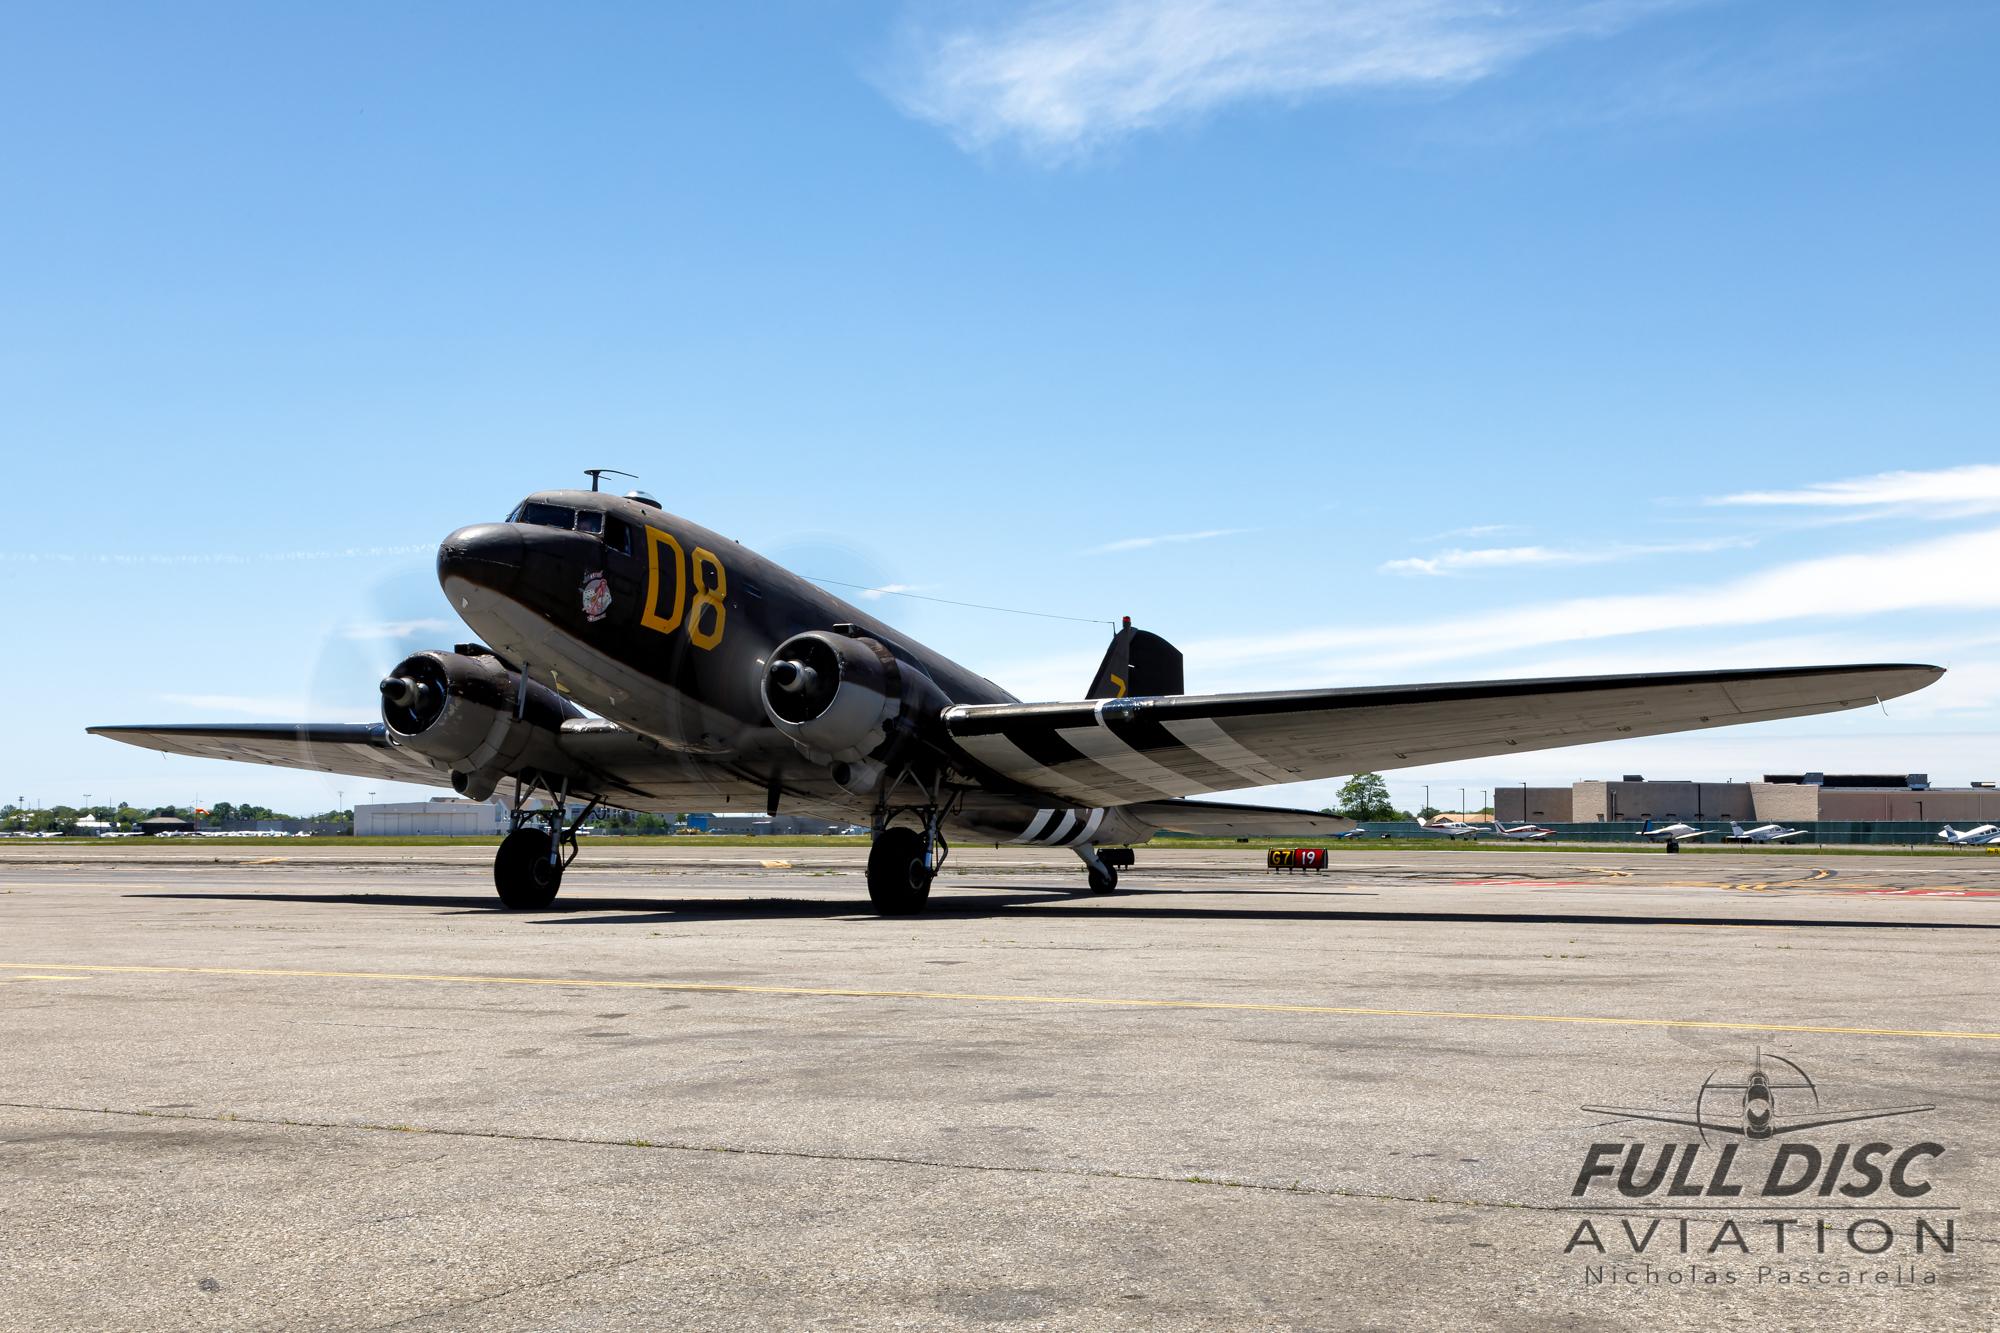 americanairpowermuseum_nicholaspascarella_nickpascarella_fulldiscaviation_legendsofairpower2019_aviation_warbird_c47_gooneybird_taxi.jpg